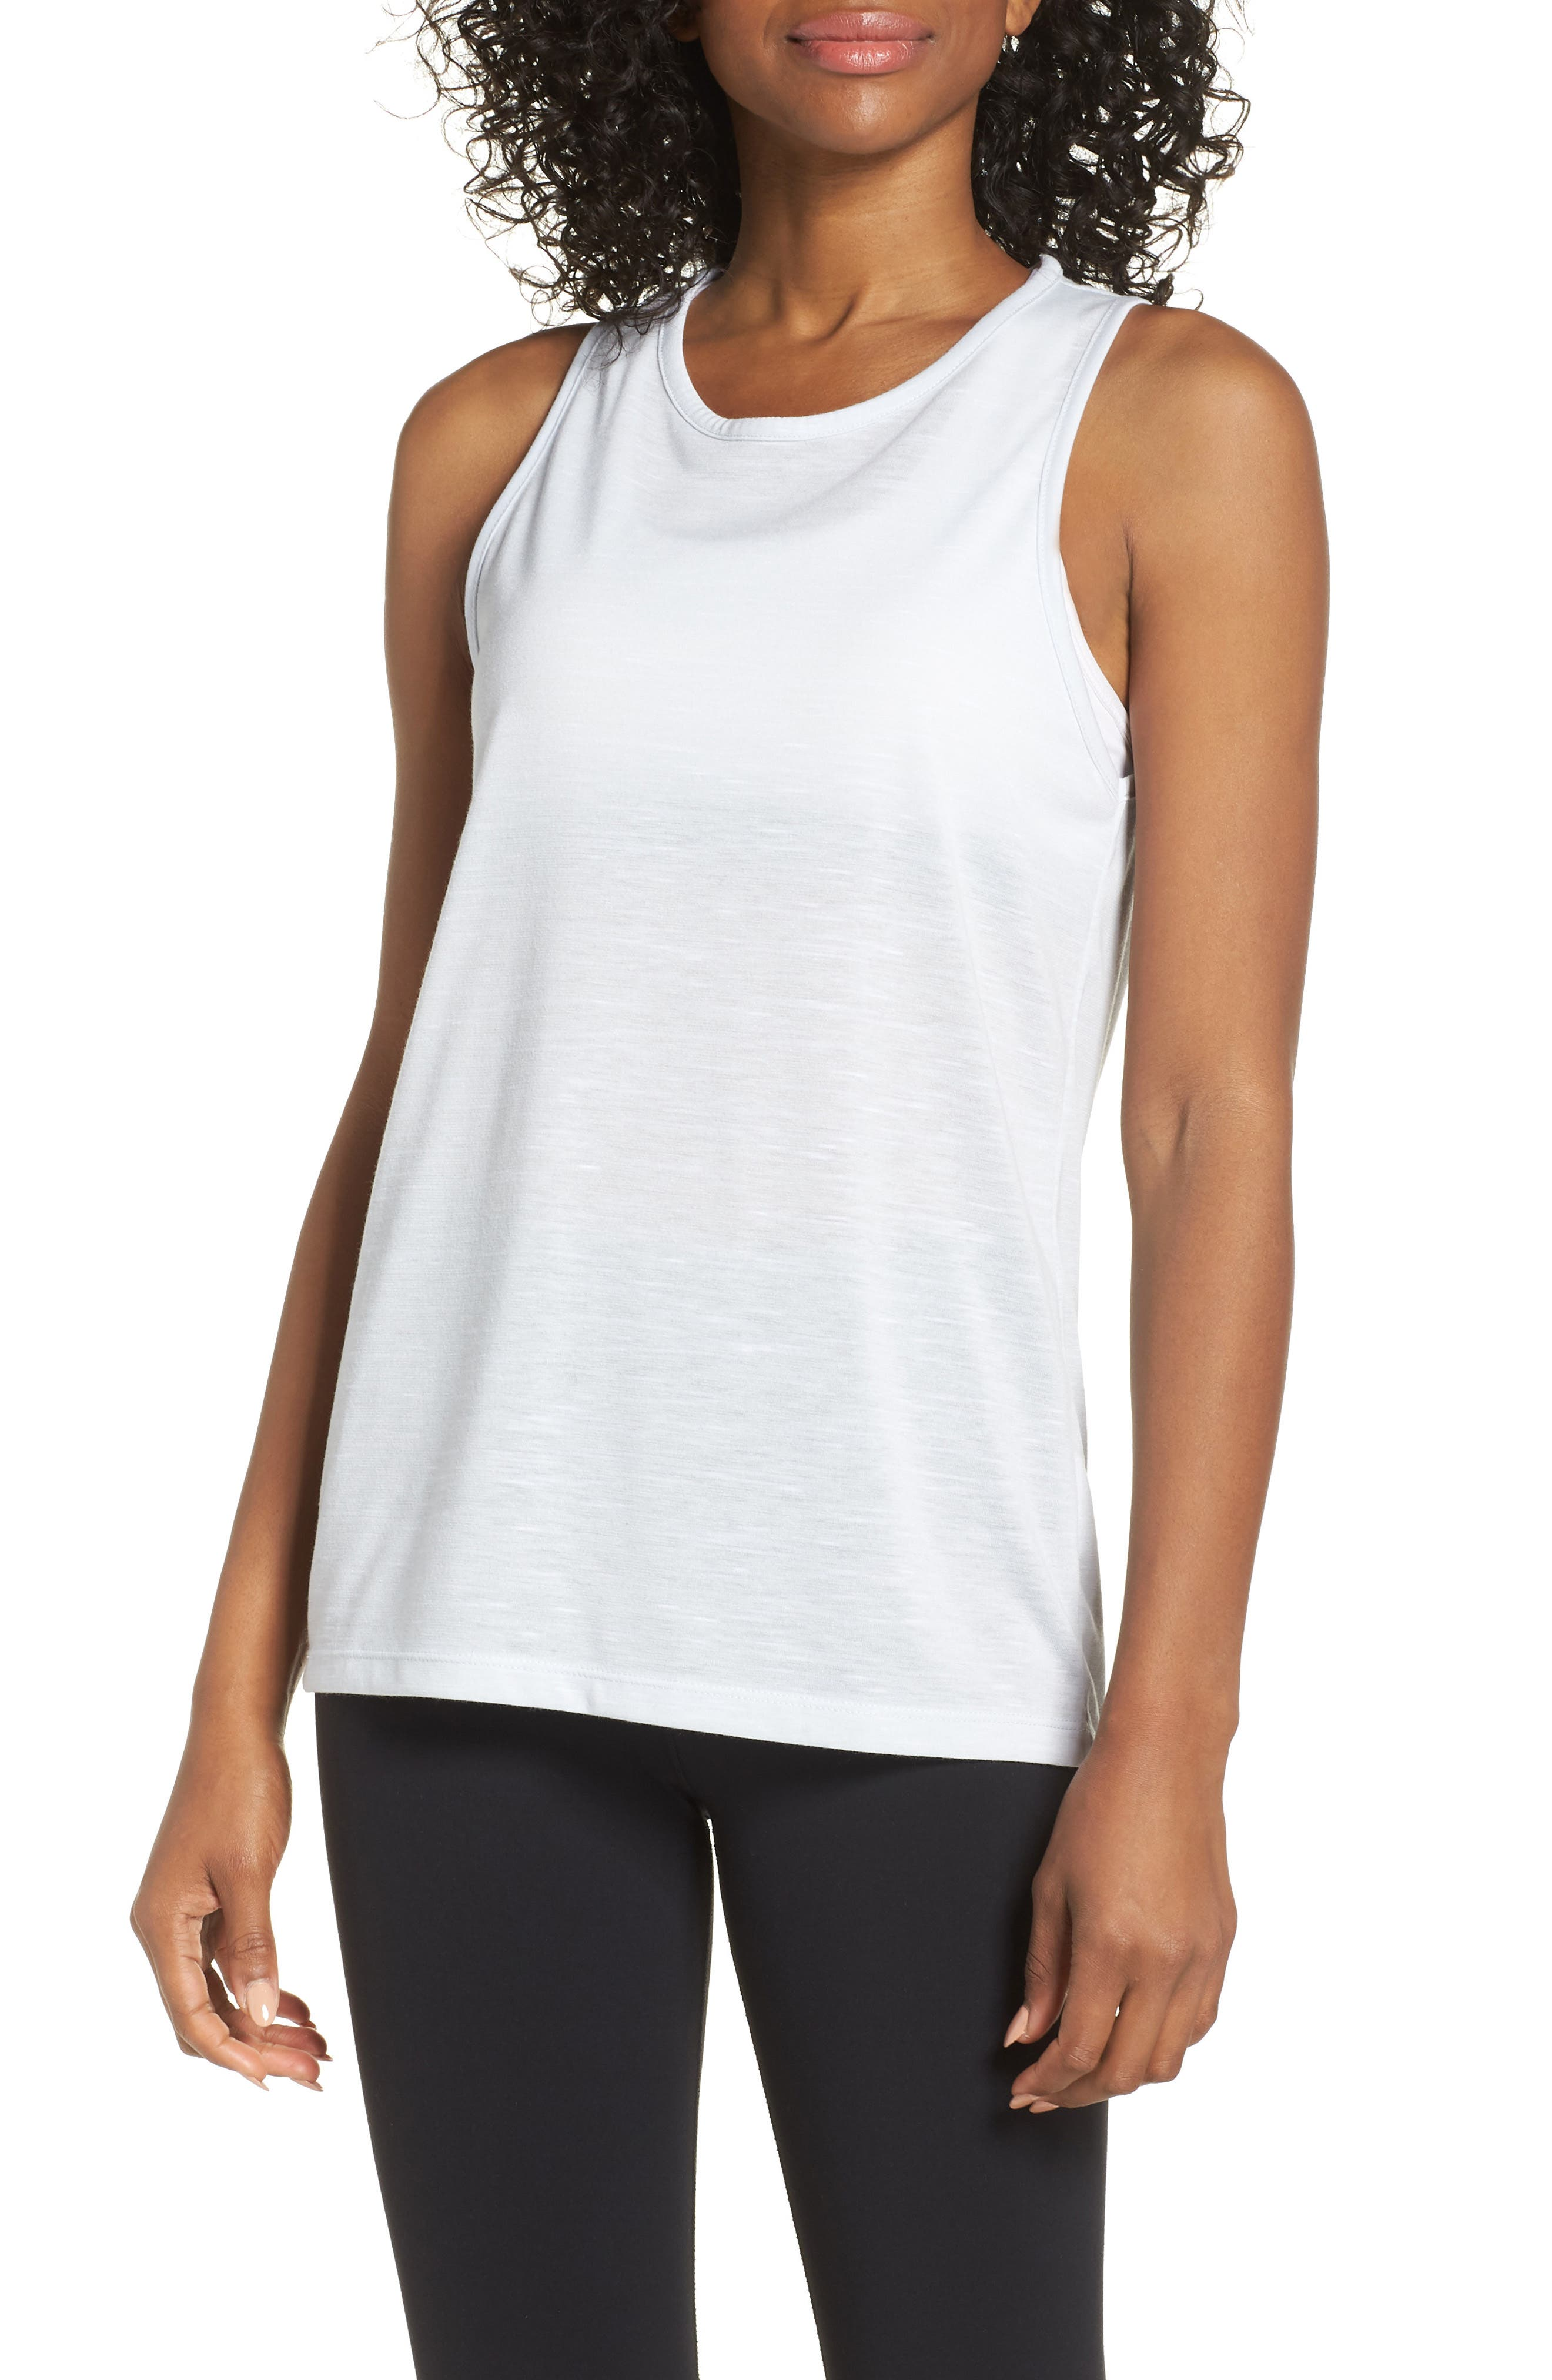 97434f17f8016 Nike Tank Tops for Women